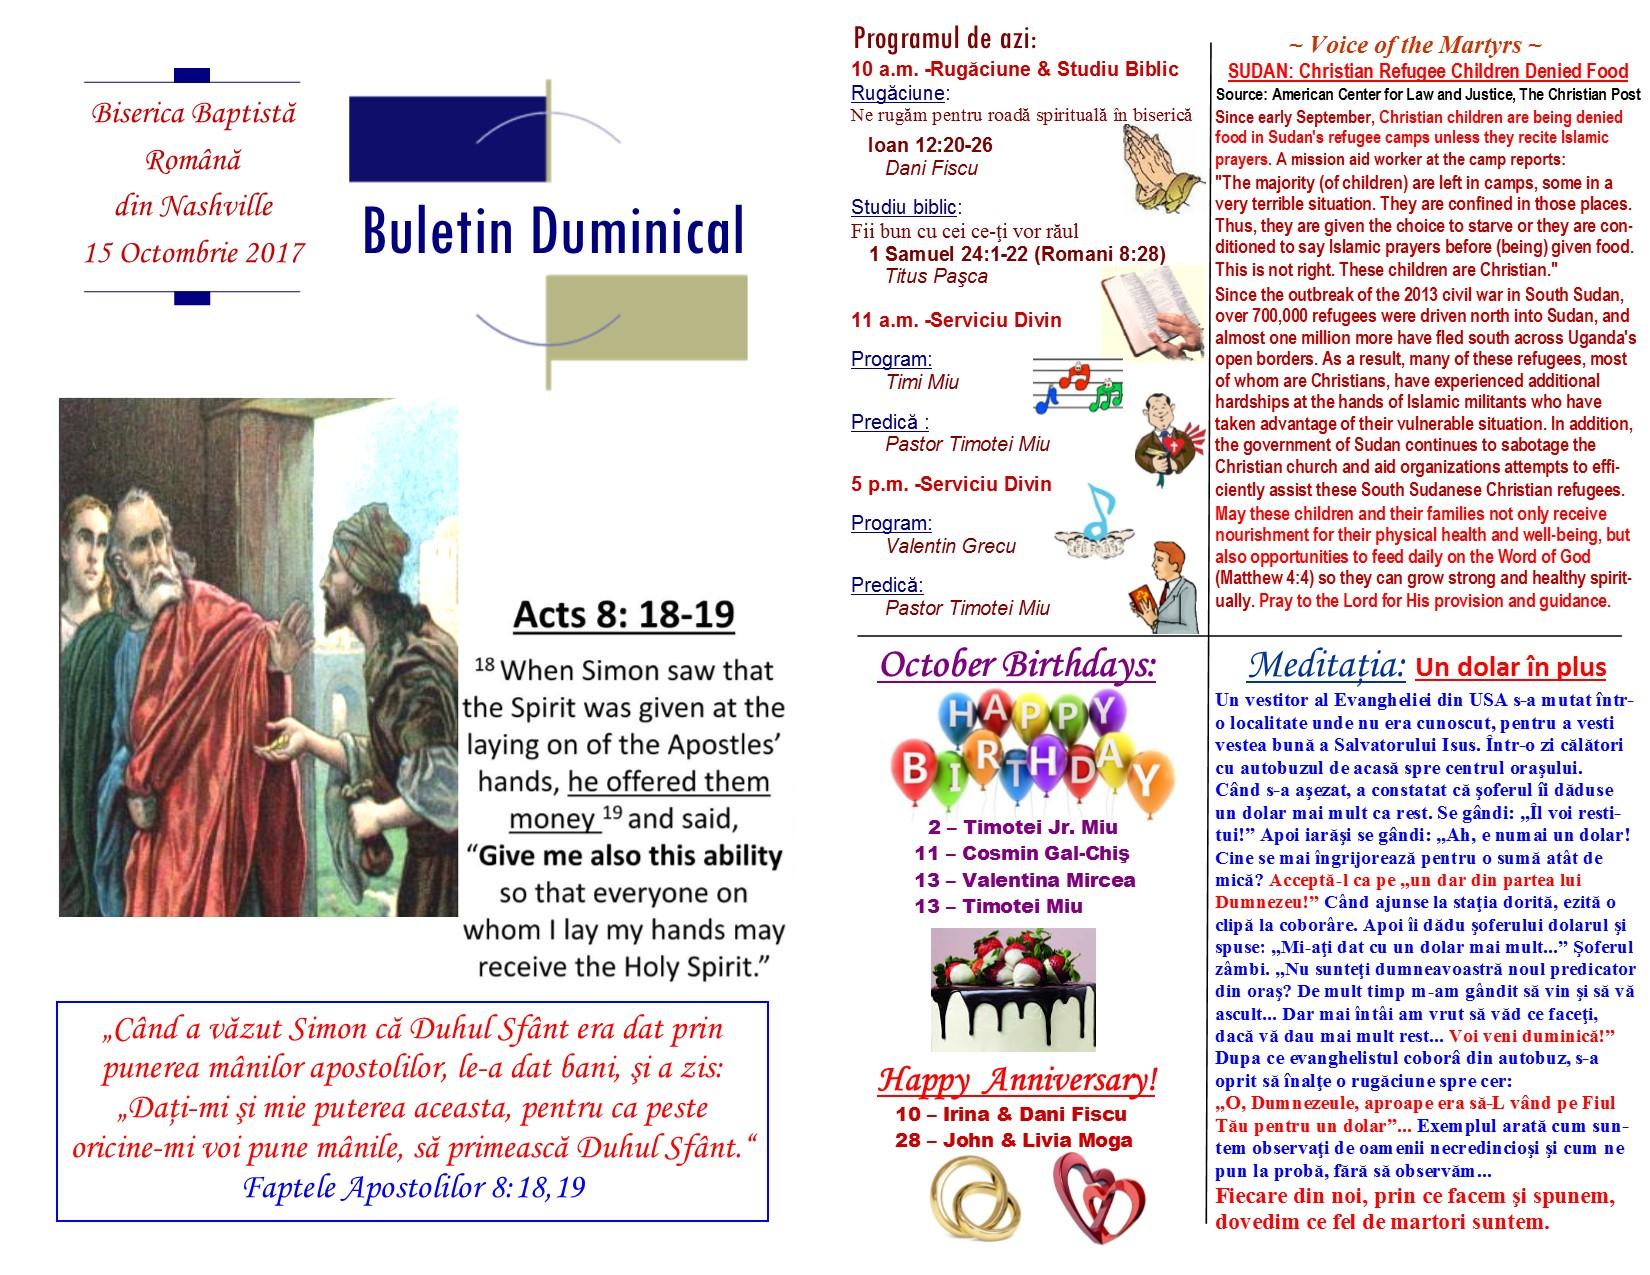 Buletin 10-15-17 page 1 & 2